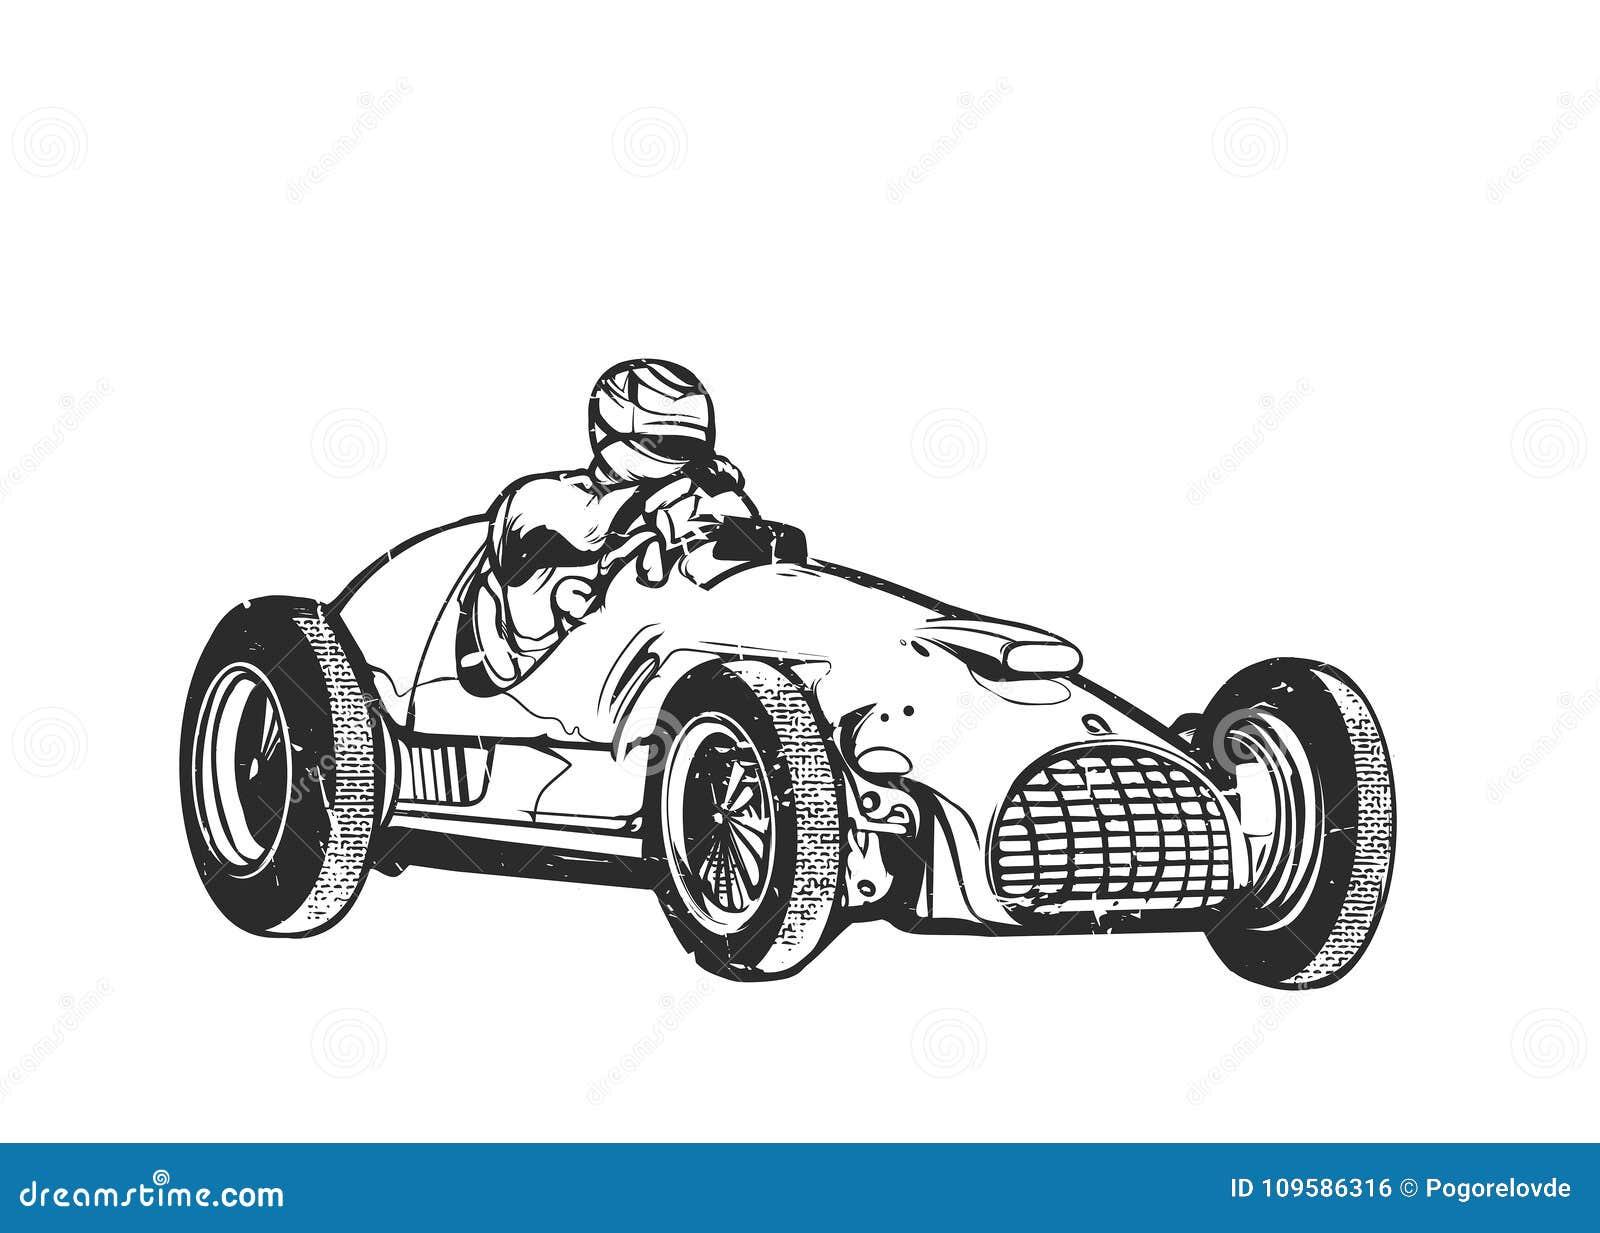 Vintage Racing Car Stock Illustrations 3 858 Vintage Racing Car Stock Illustrations Vectors Clipart Dreamstime